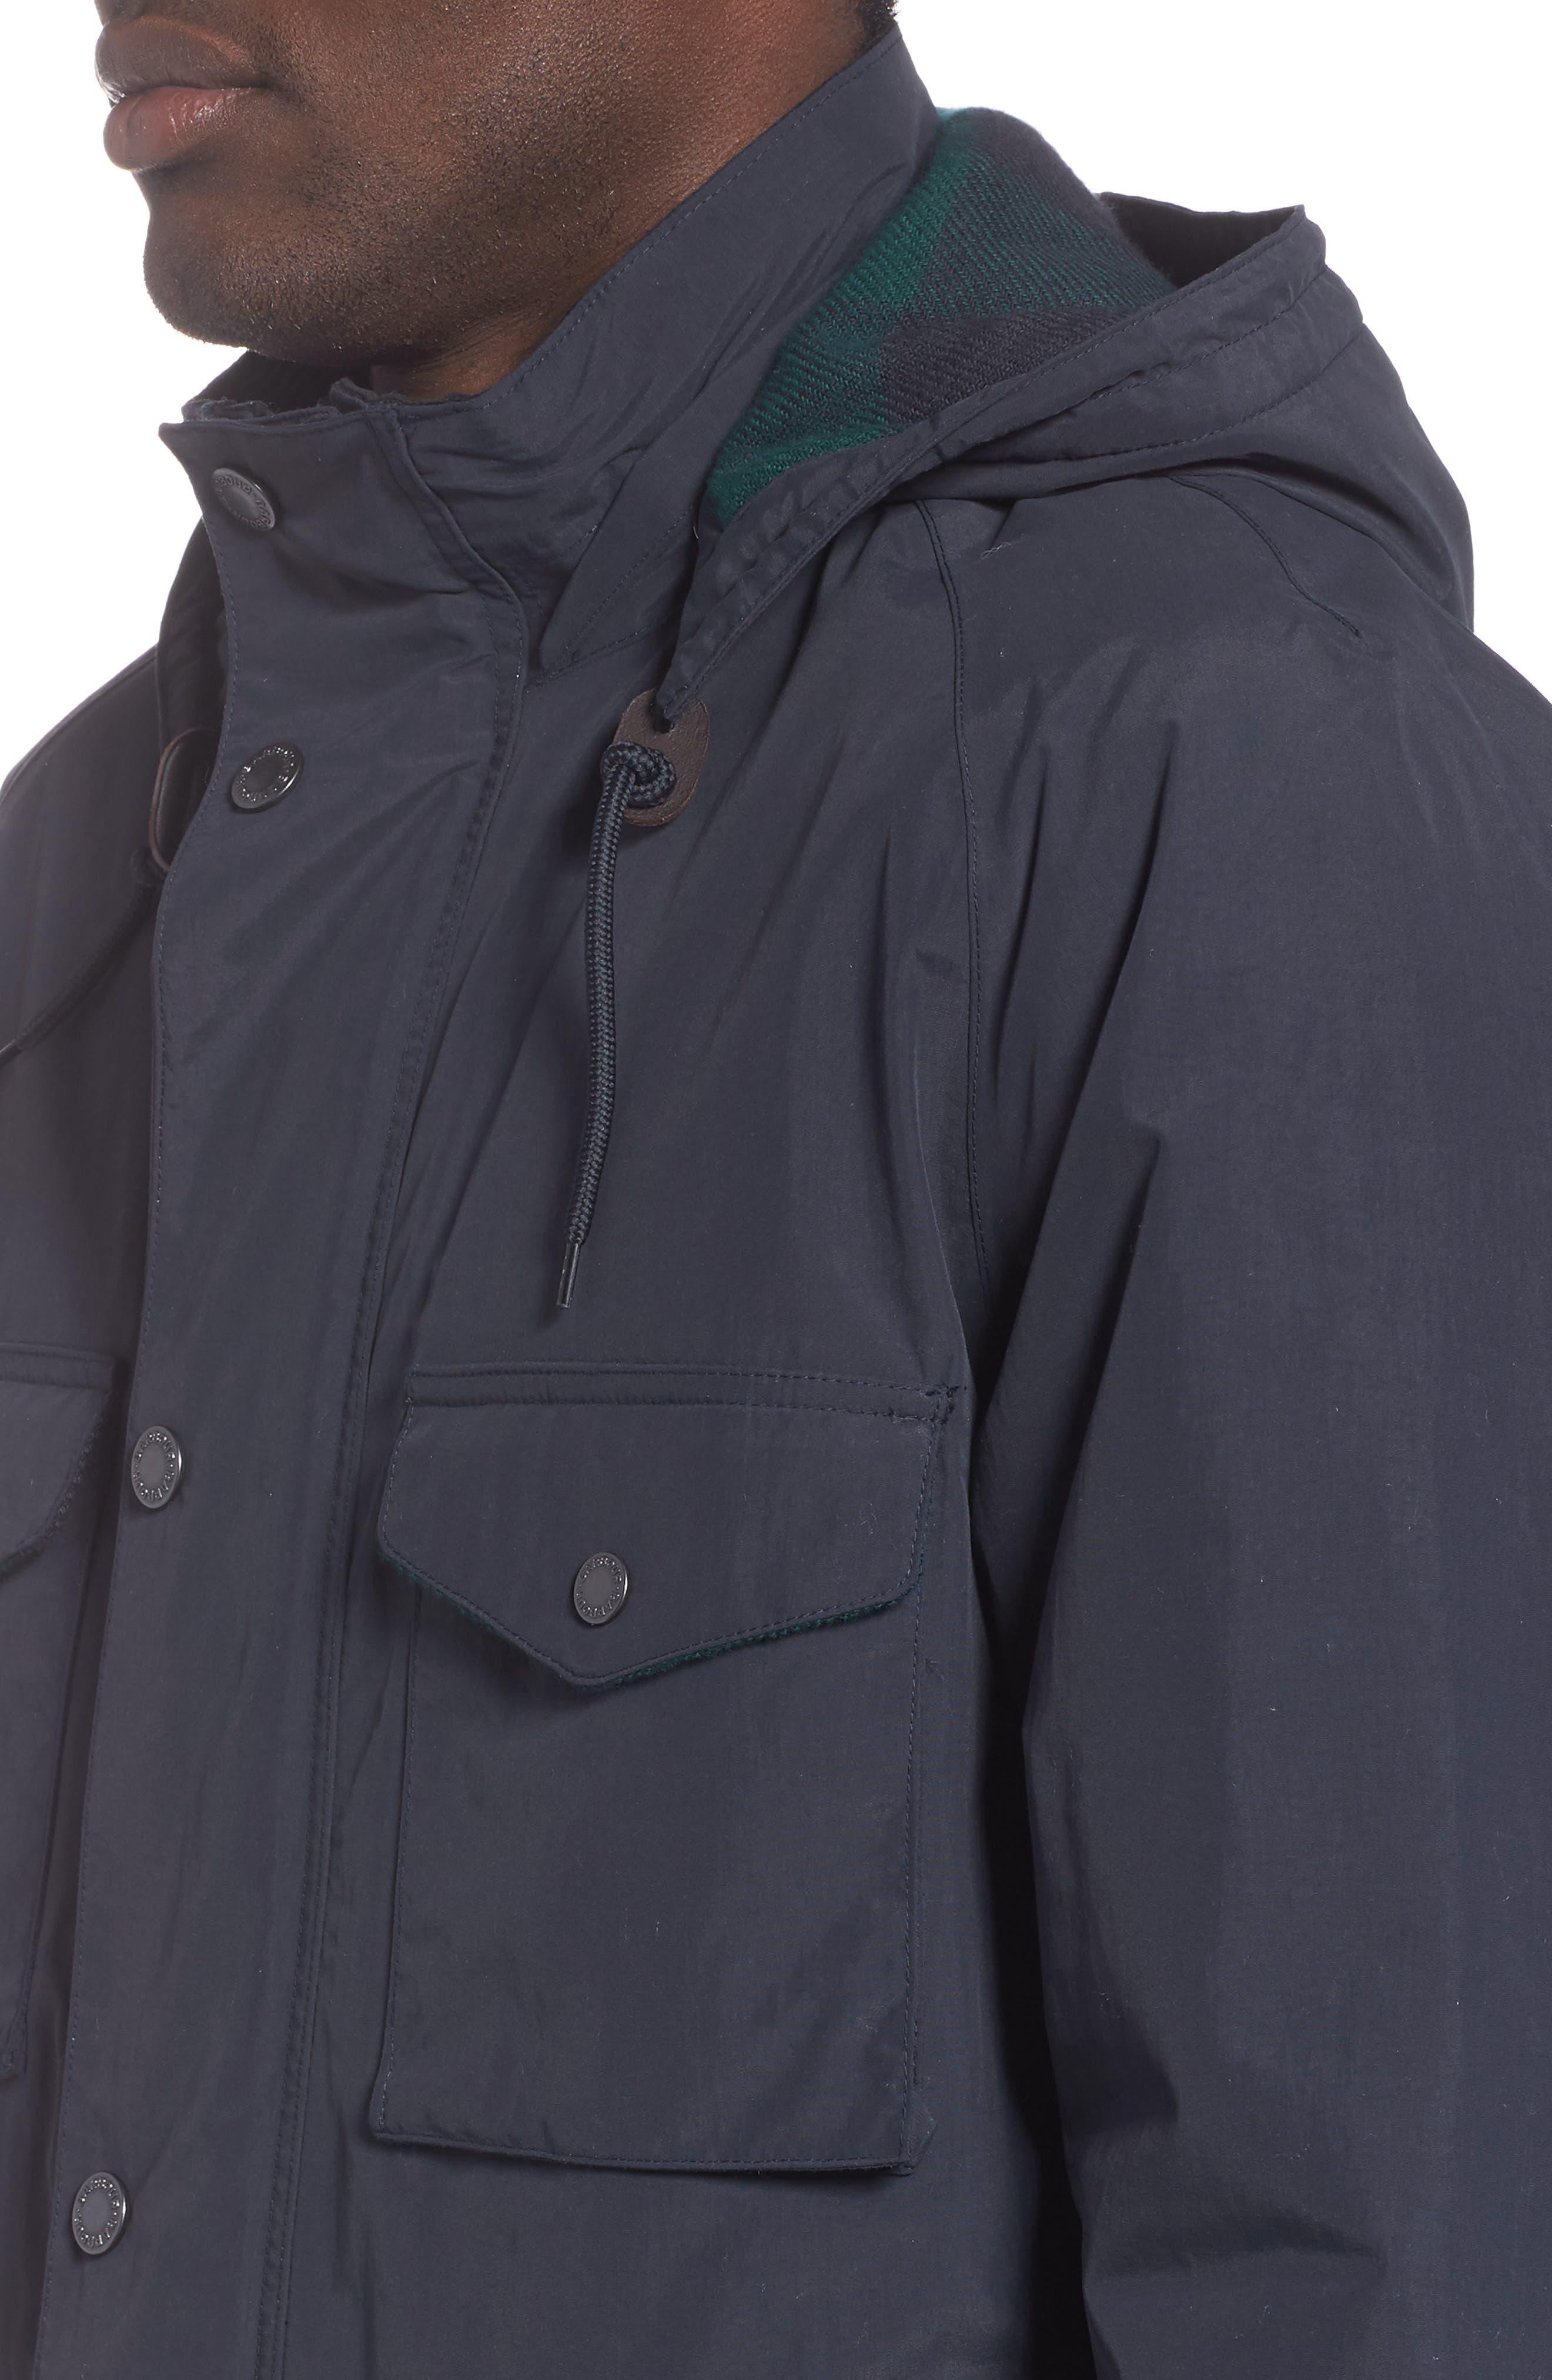 BARBOUR, Tiree Waterproof Jacket, Alternate thumbnail 4, color, 410